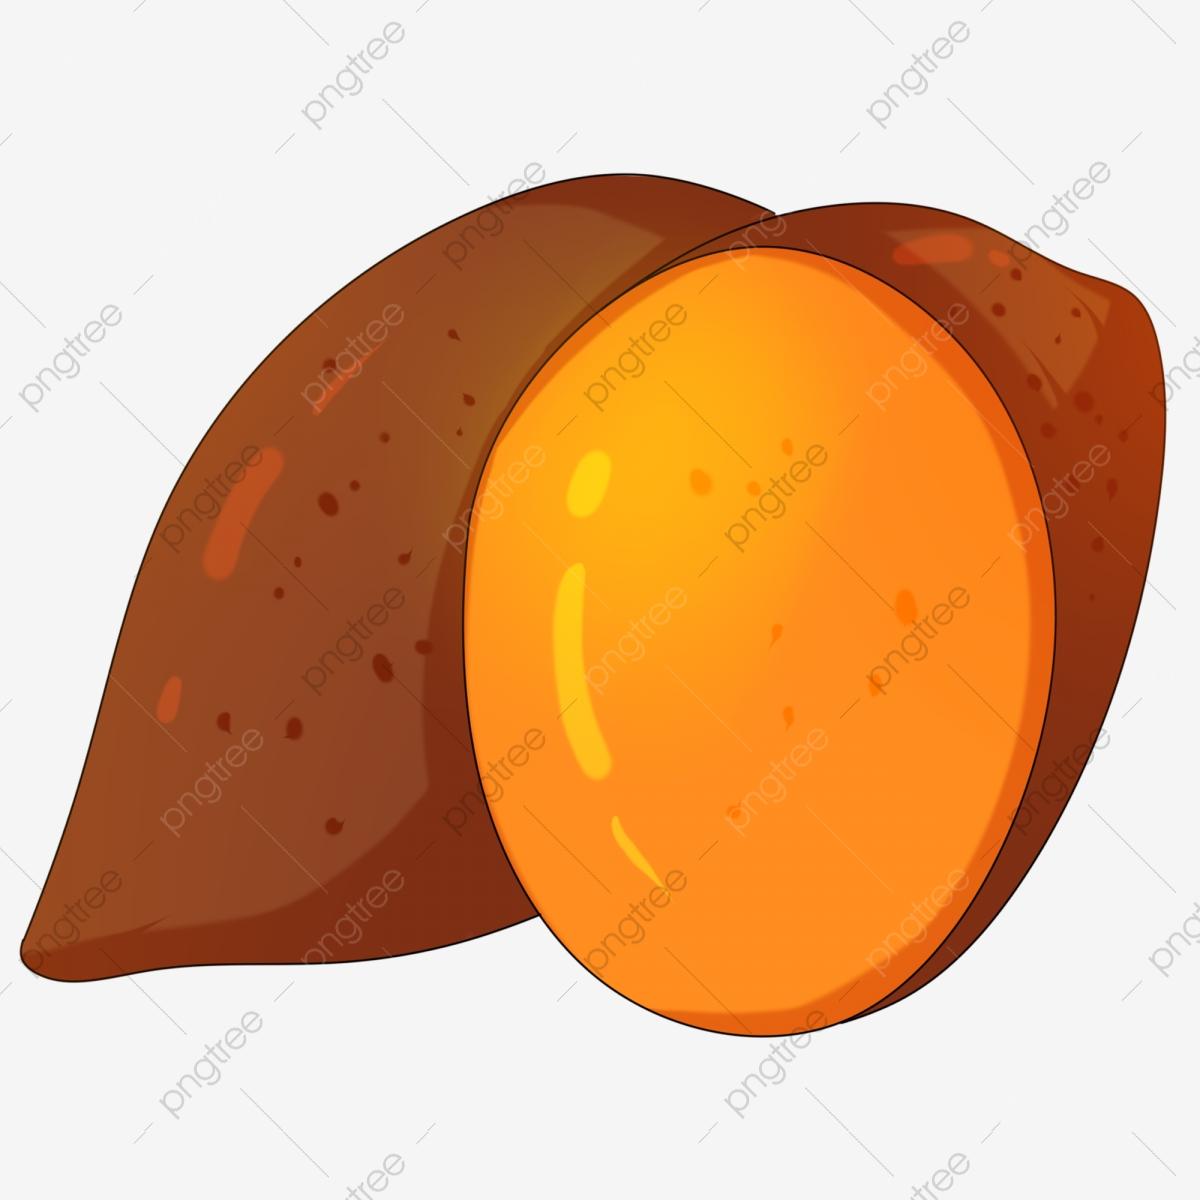 Sweet Potatoes, Produce, Sweet Potato, Food PNG Transparent Clipart.